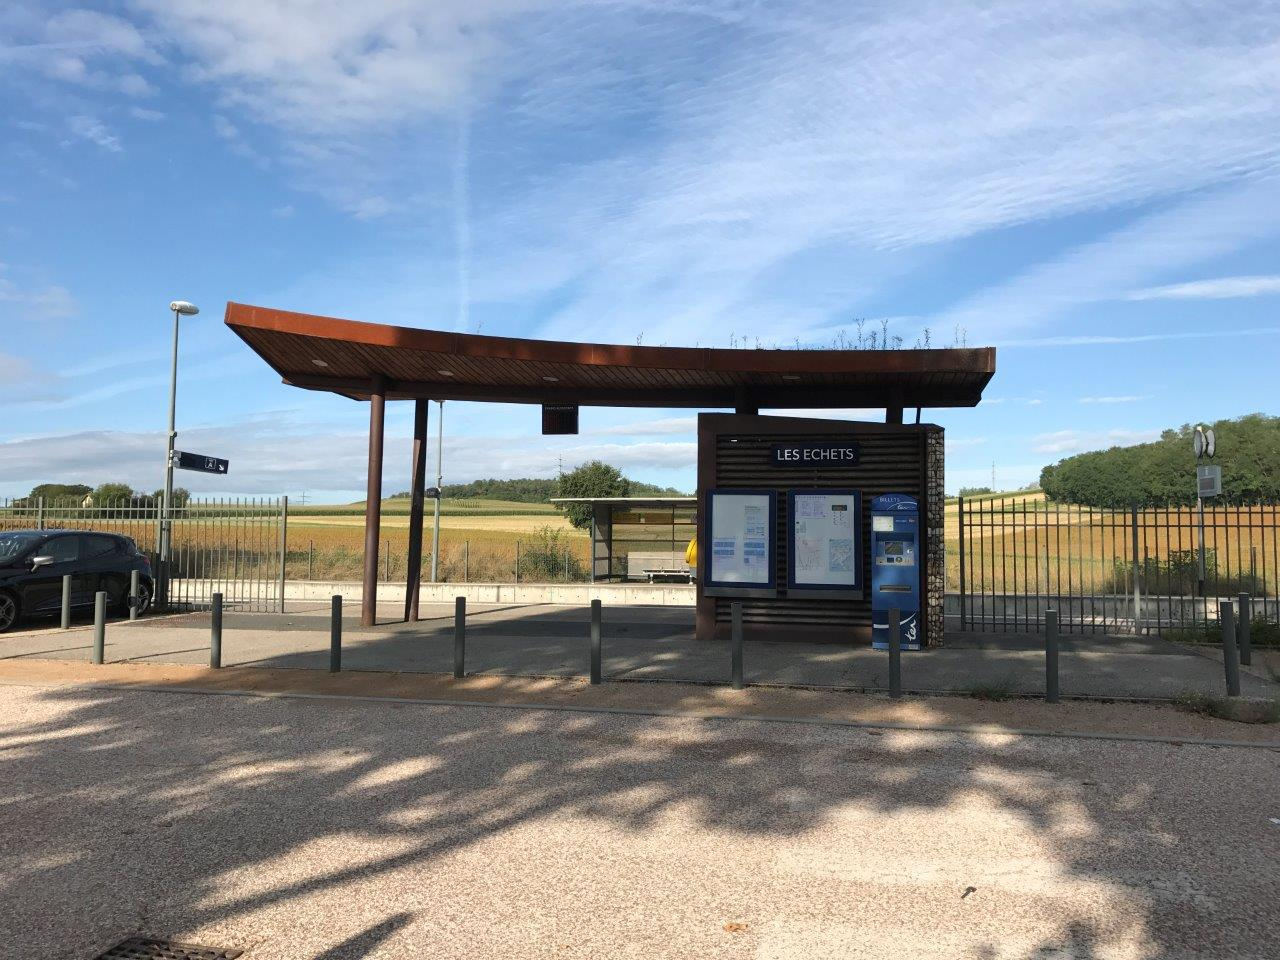 gare-des-echets-train-station